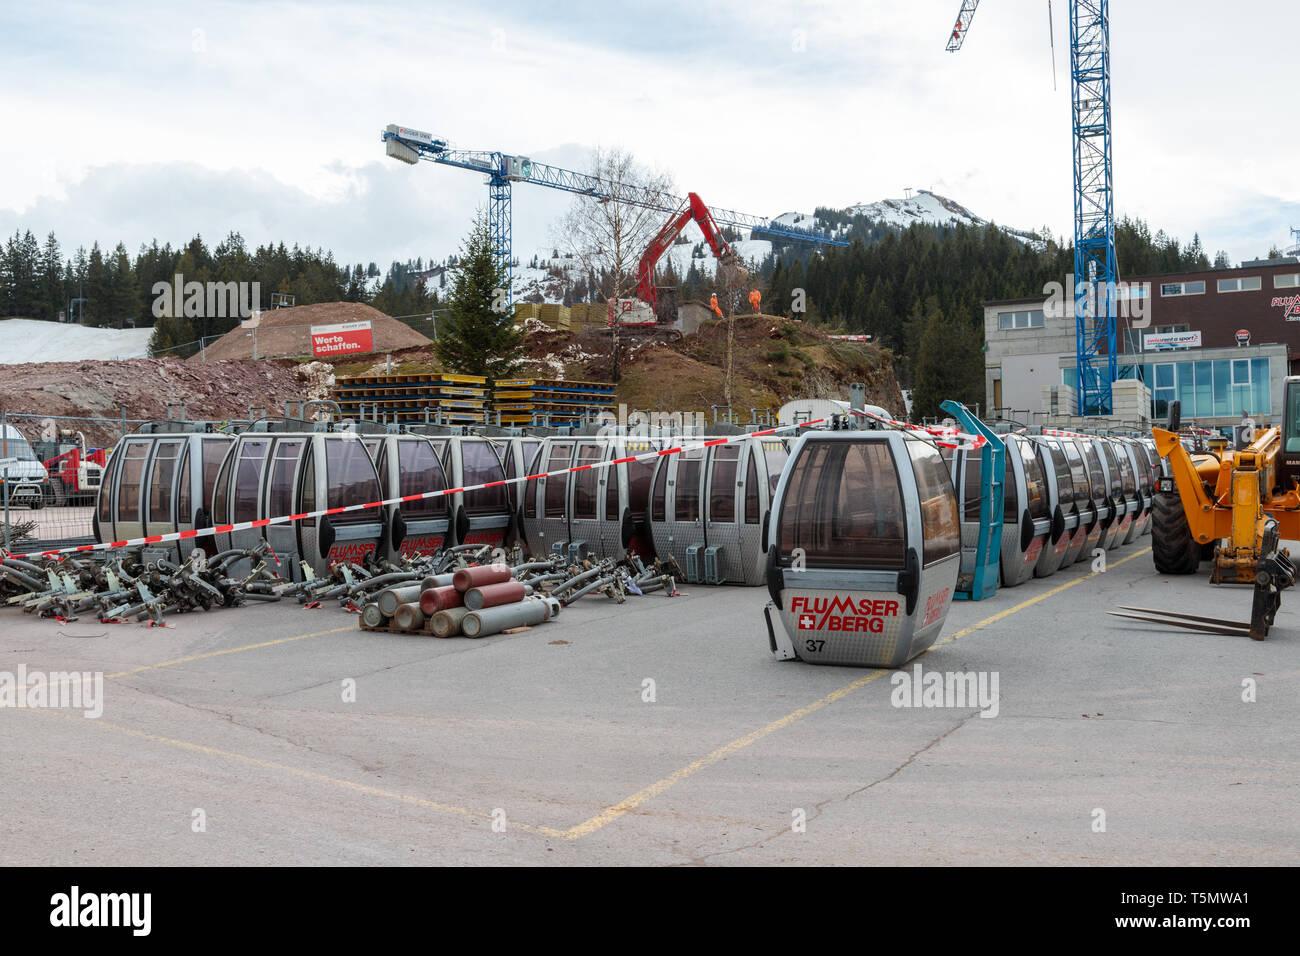 Maschgenkamm Bahn Gondolas after removal - Stock Image